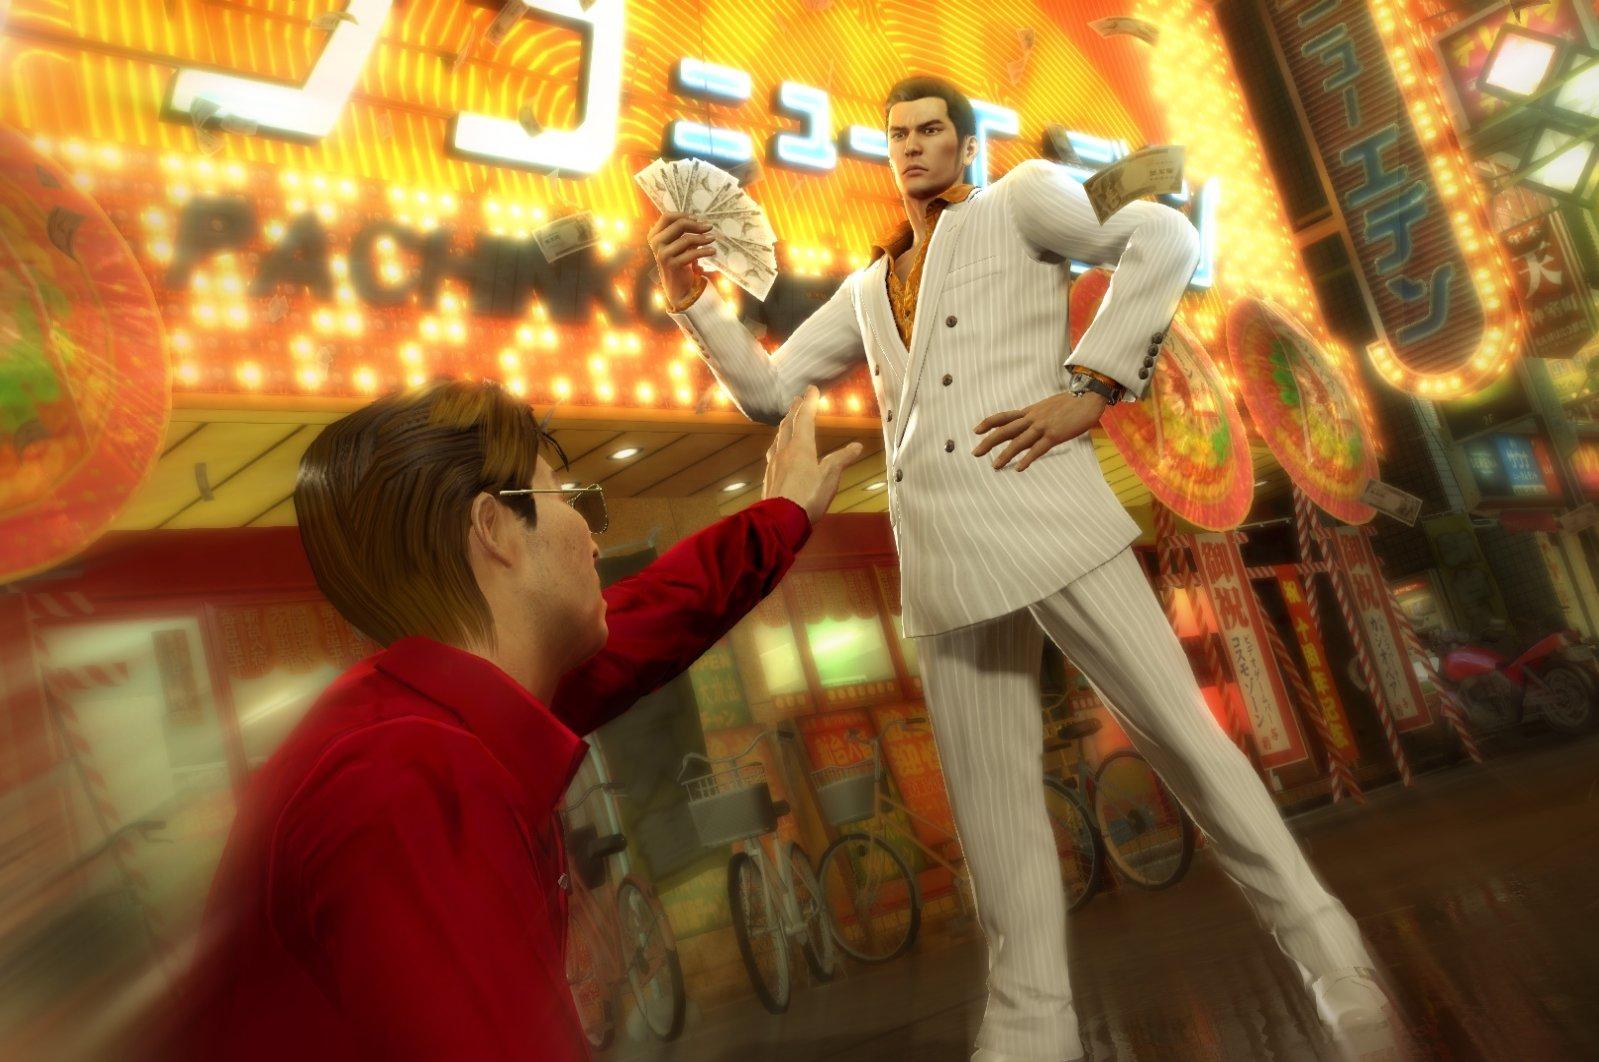 A screengrab from the game shows Kiryu Kazuma with a wad of cash in Yakuza 0. (Credit: Sega Games)